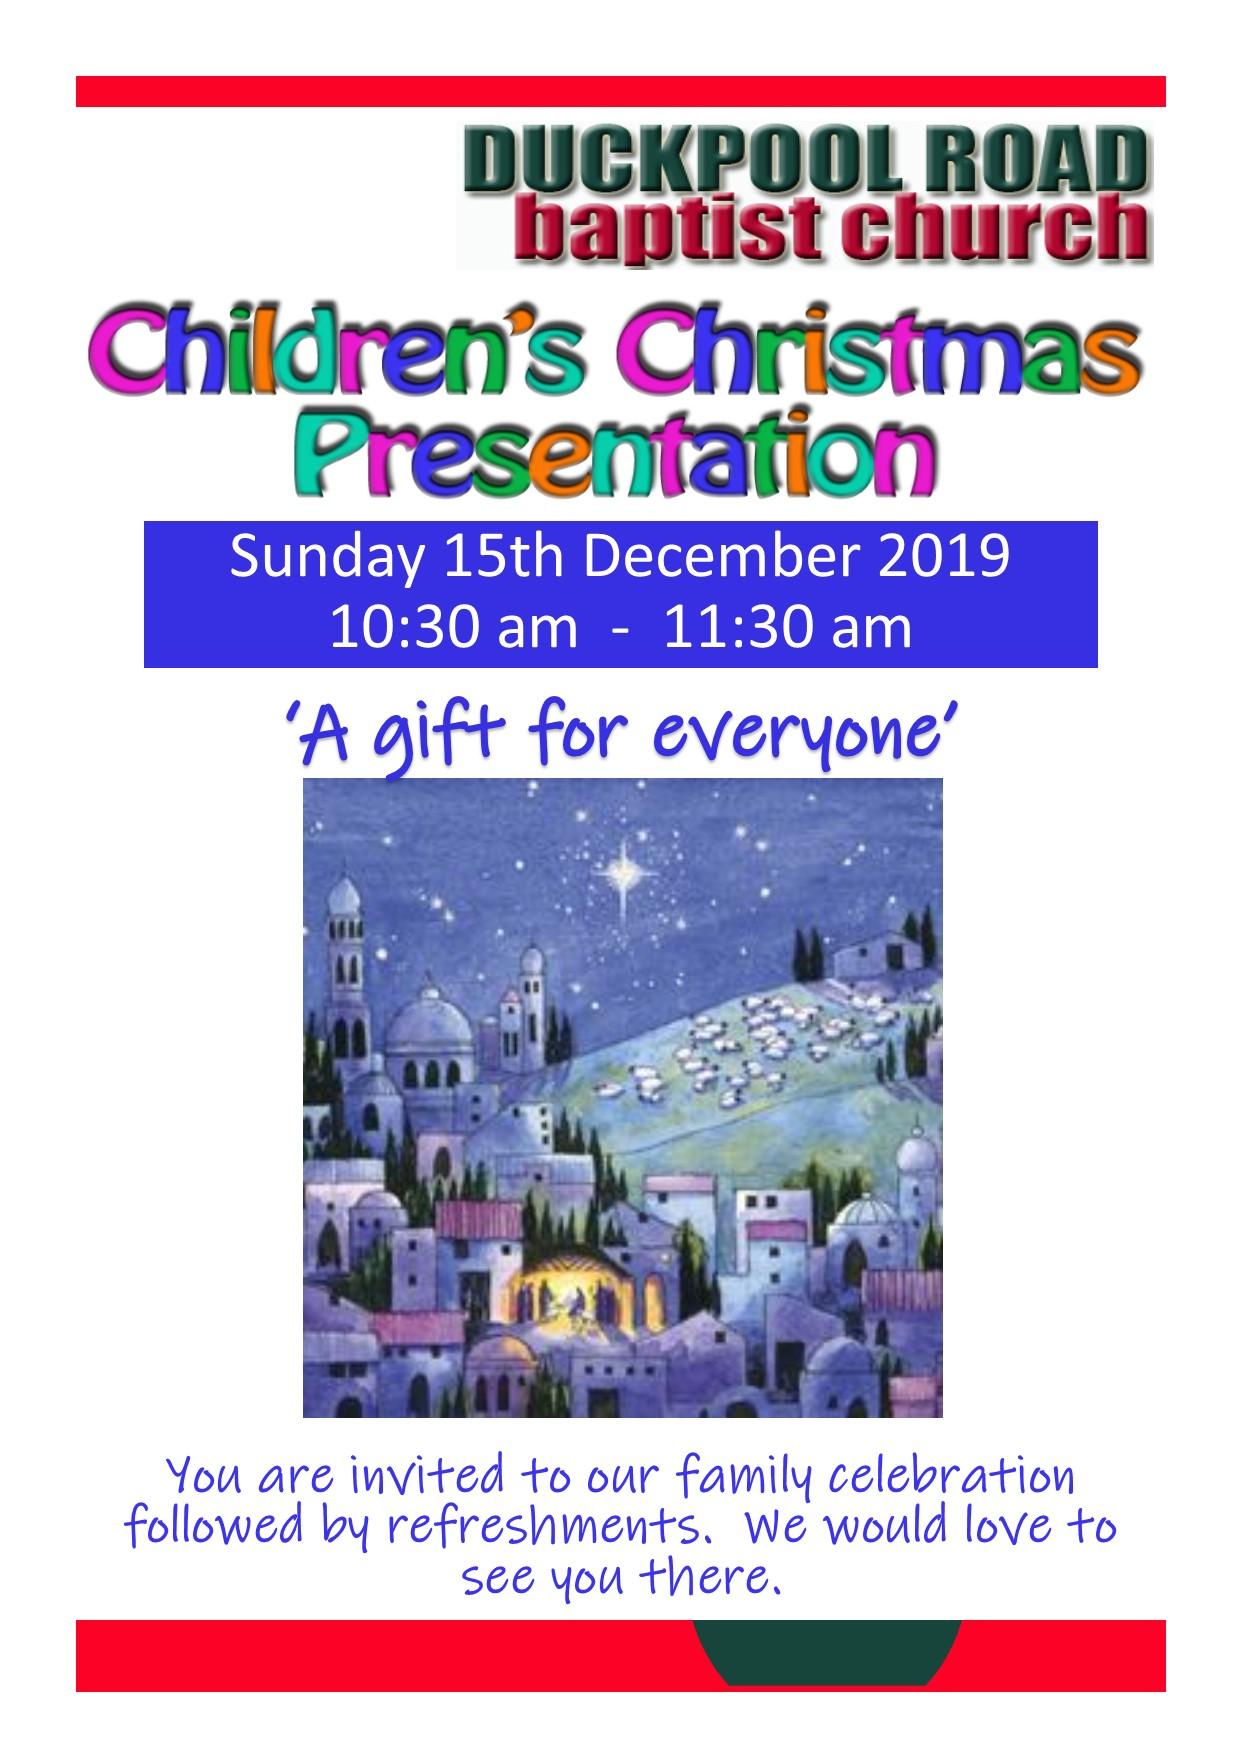 Children's Christmas Presentation